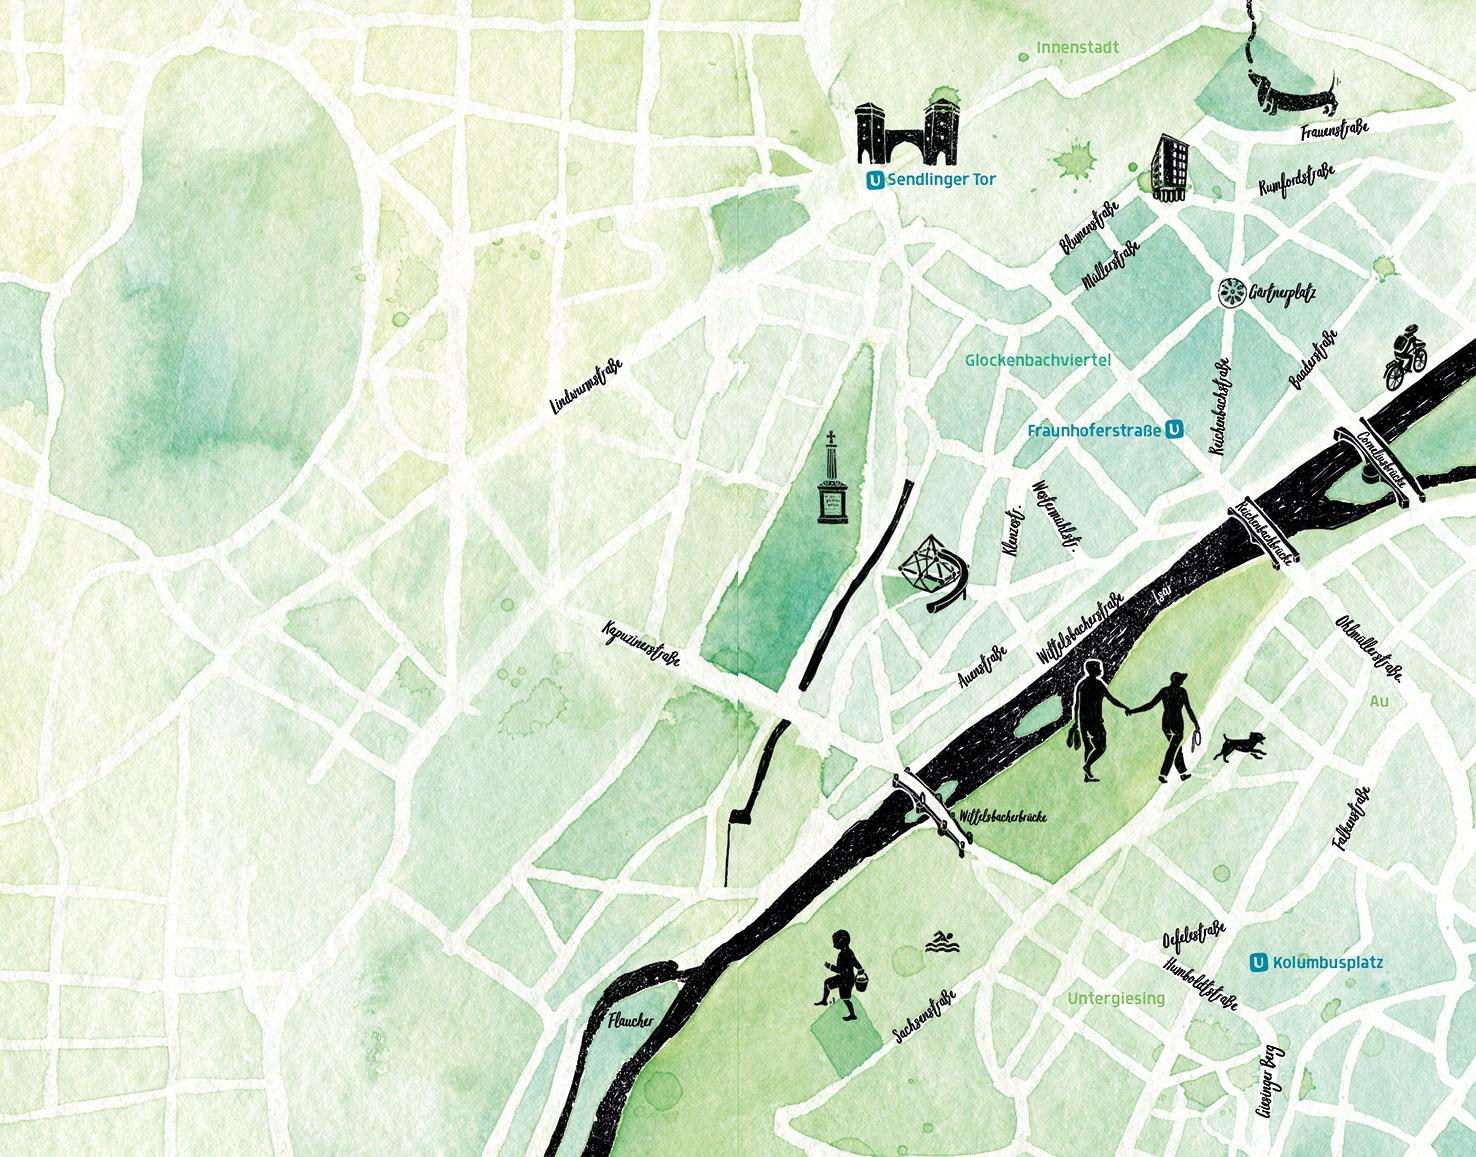 Stadtplan Glockenbach